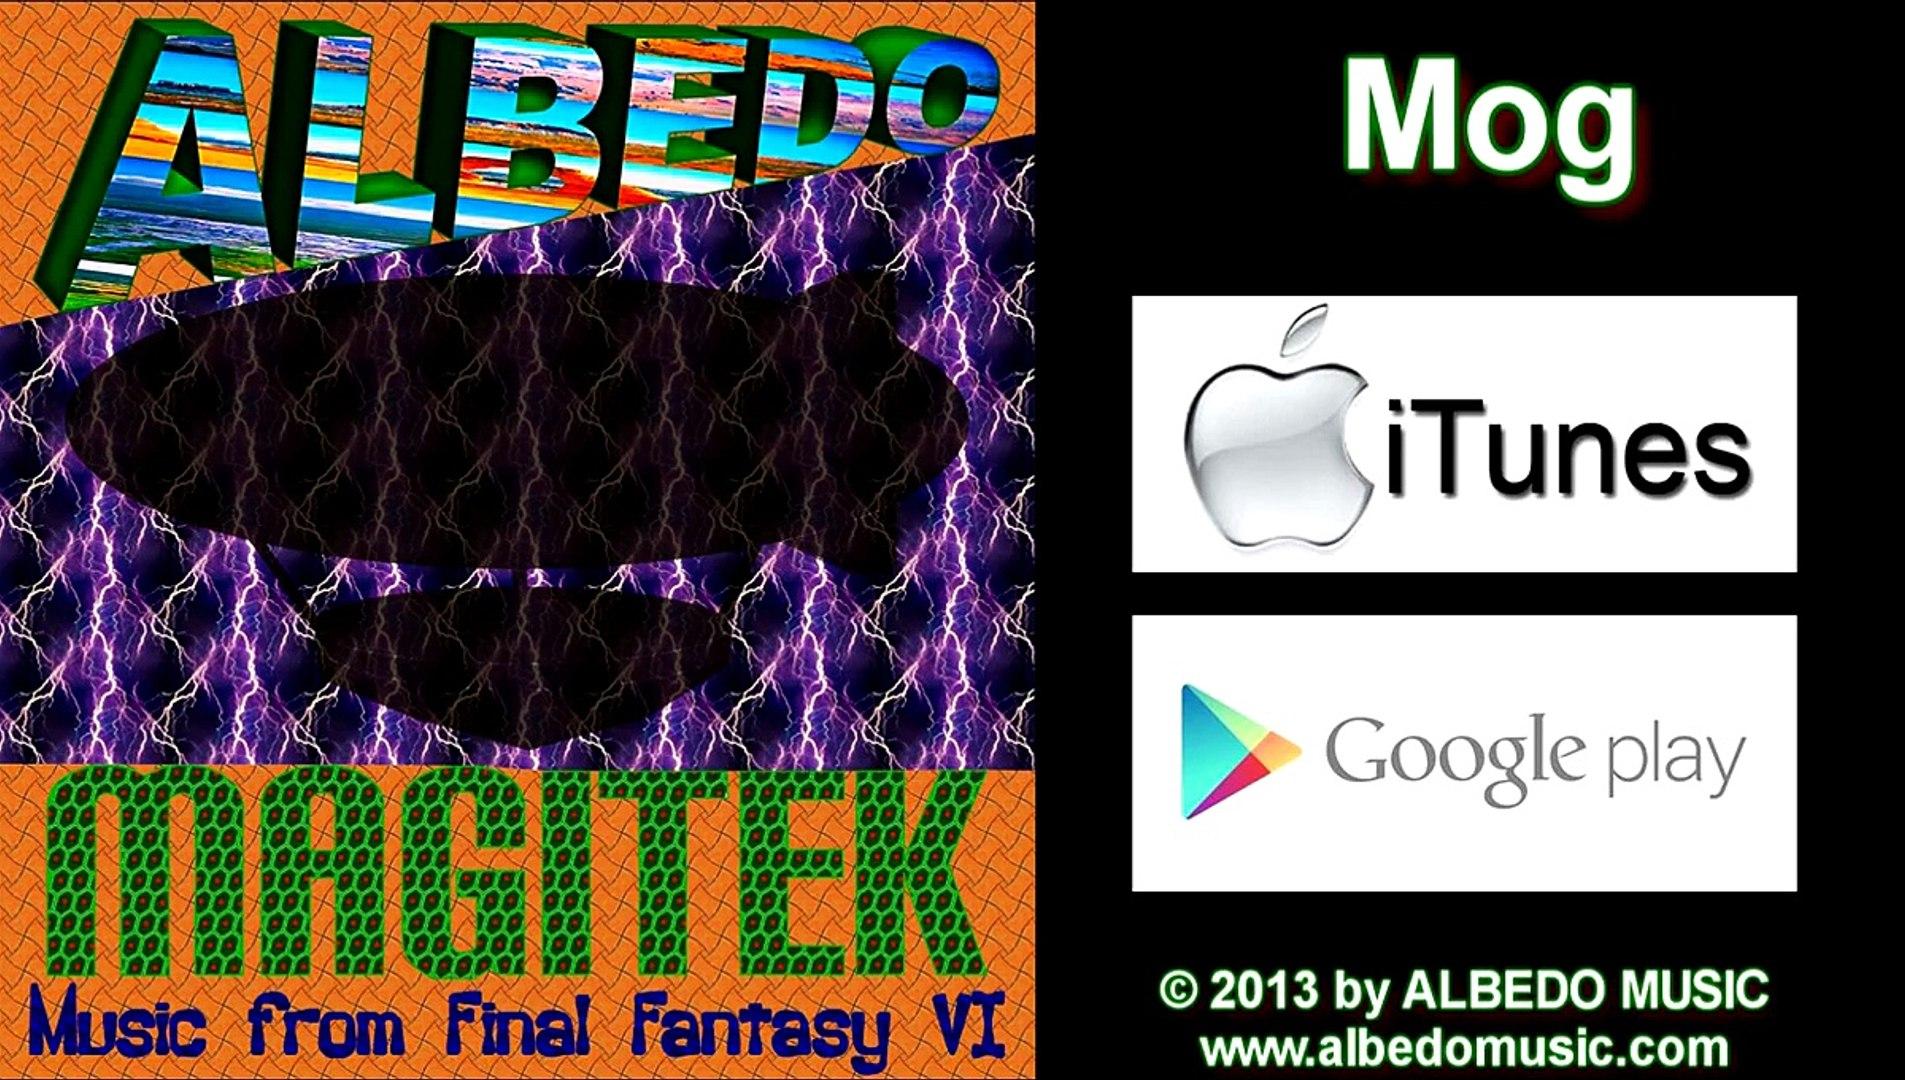 Mog, Final Fantasy VI- Cover by ALBEDO (Magitek: Music from Final Fantasy VI)